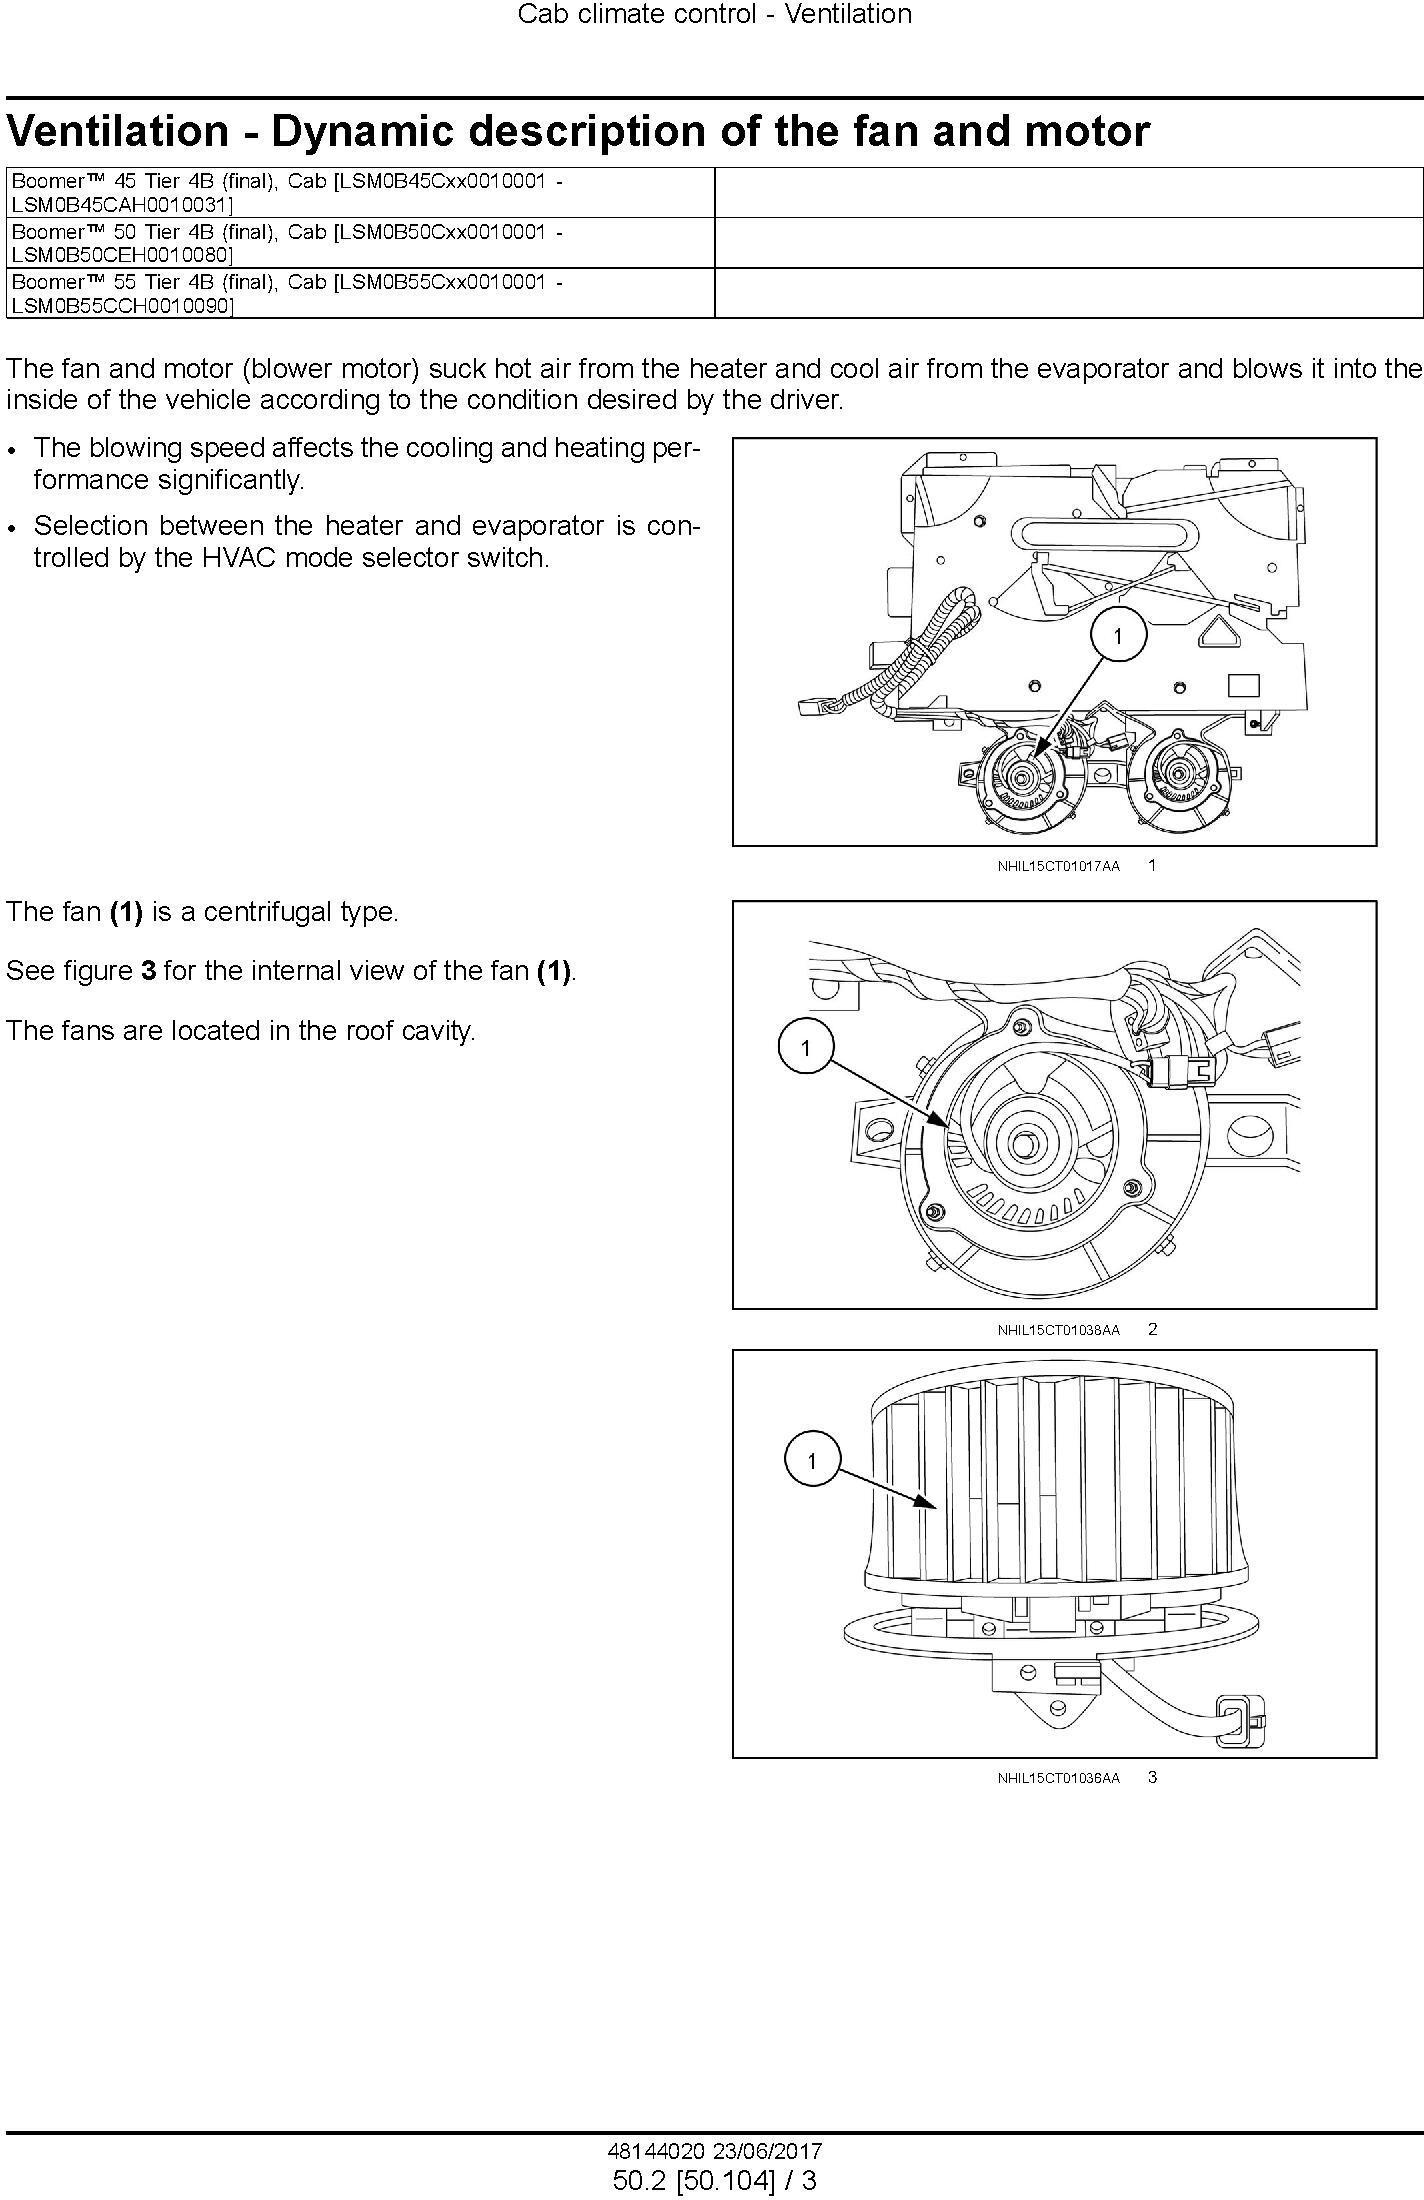 New Holland Boomer 45, Boomer 50, Boomer 55 Tier 4B final Compact Tractor Service Manual (USA) - 2